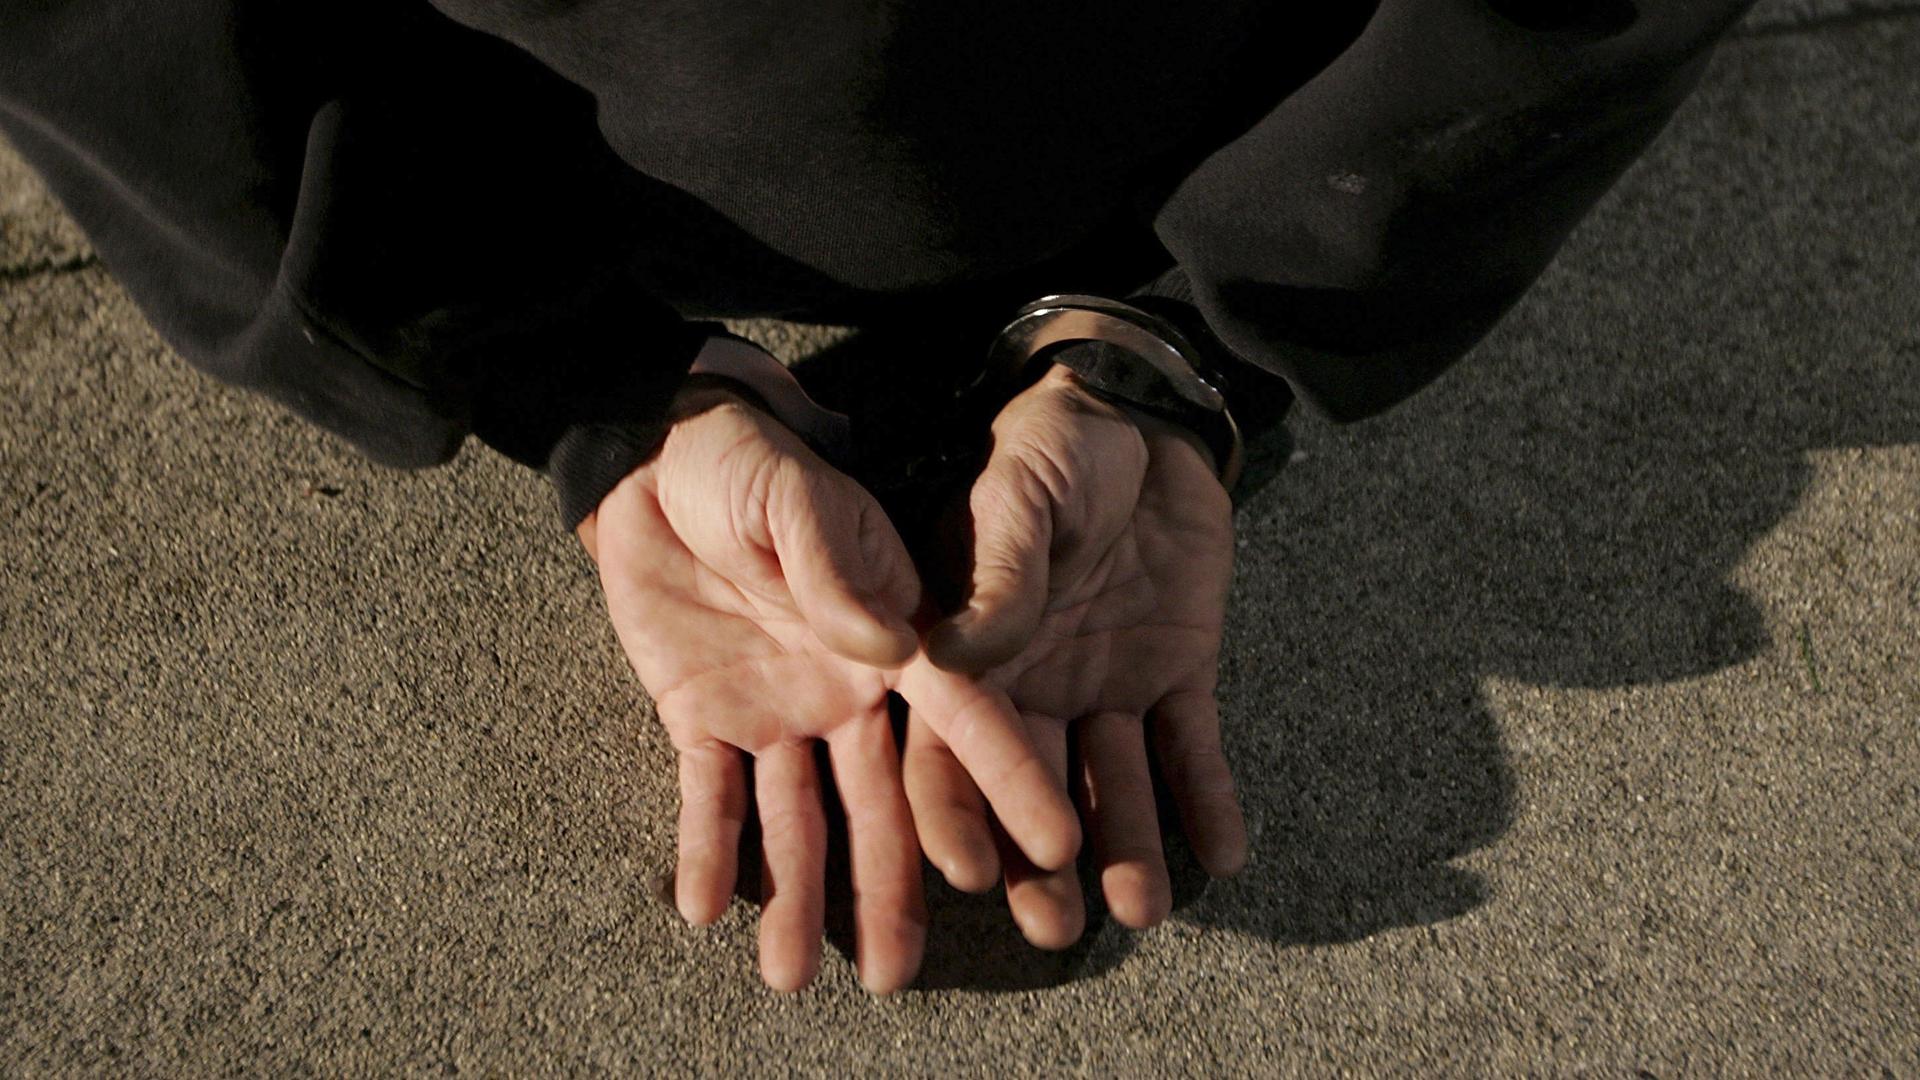 filephoto-handcuffs